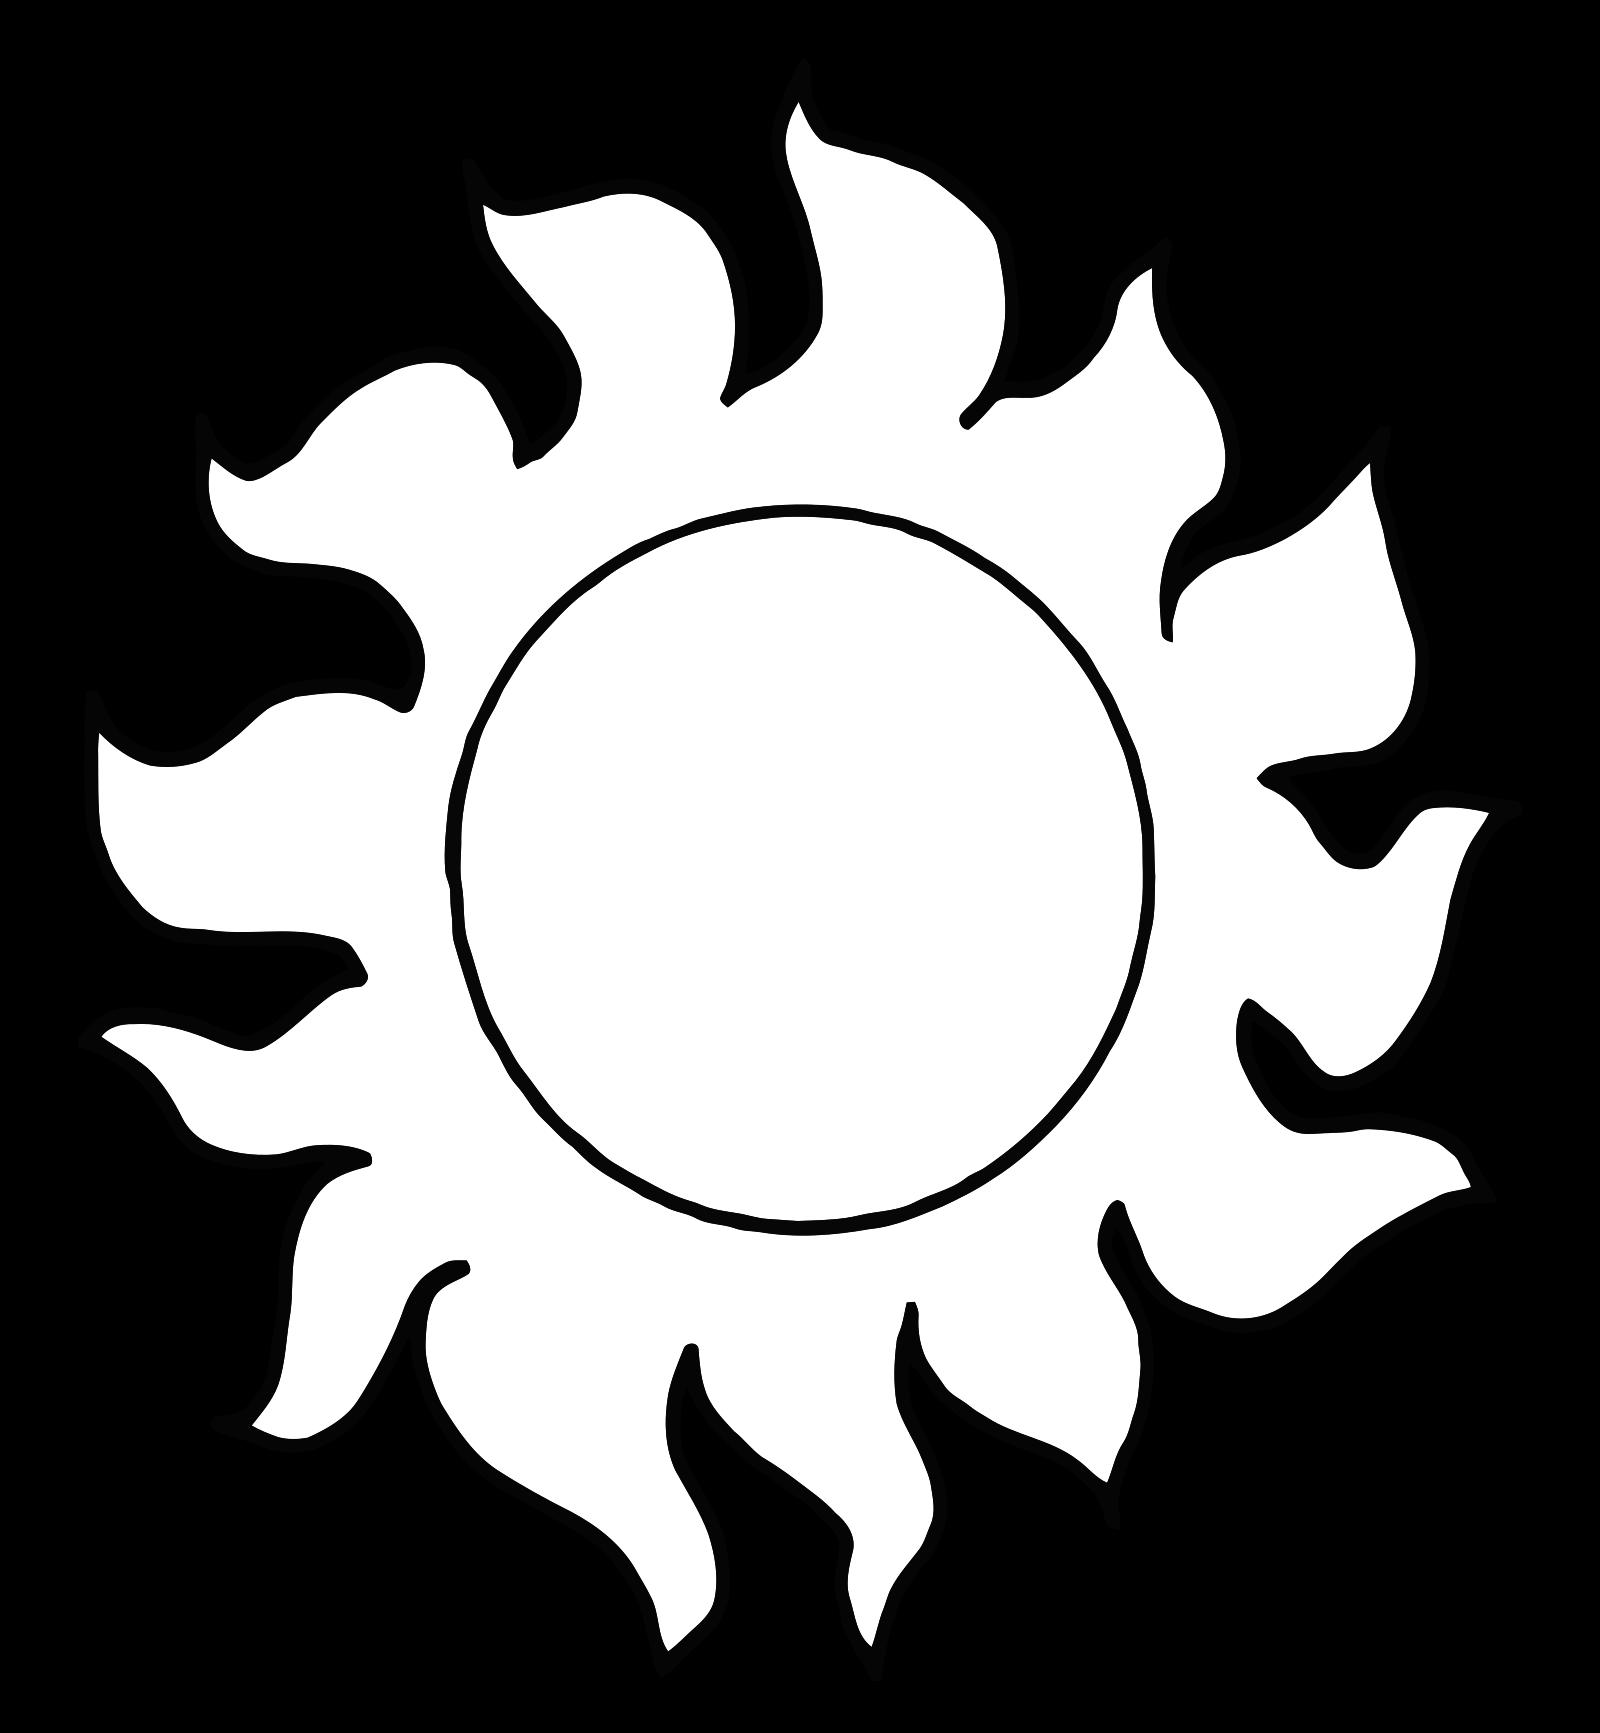 Sun SVG Clip arts